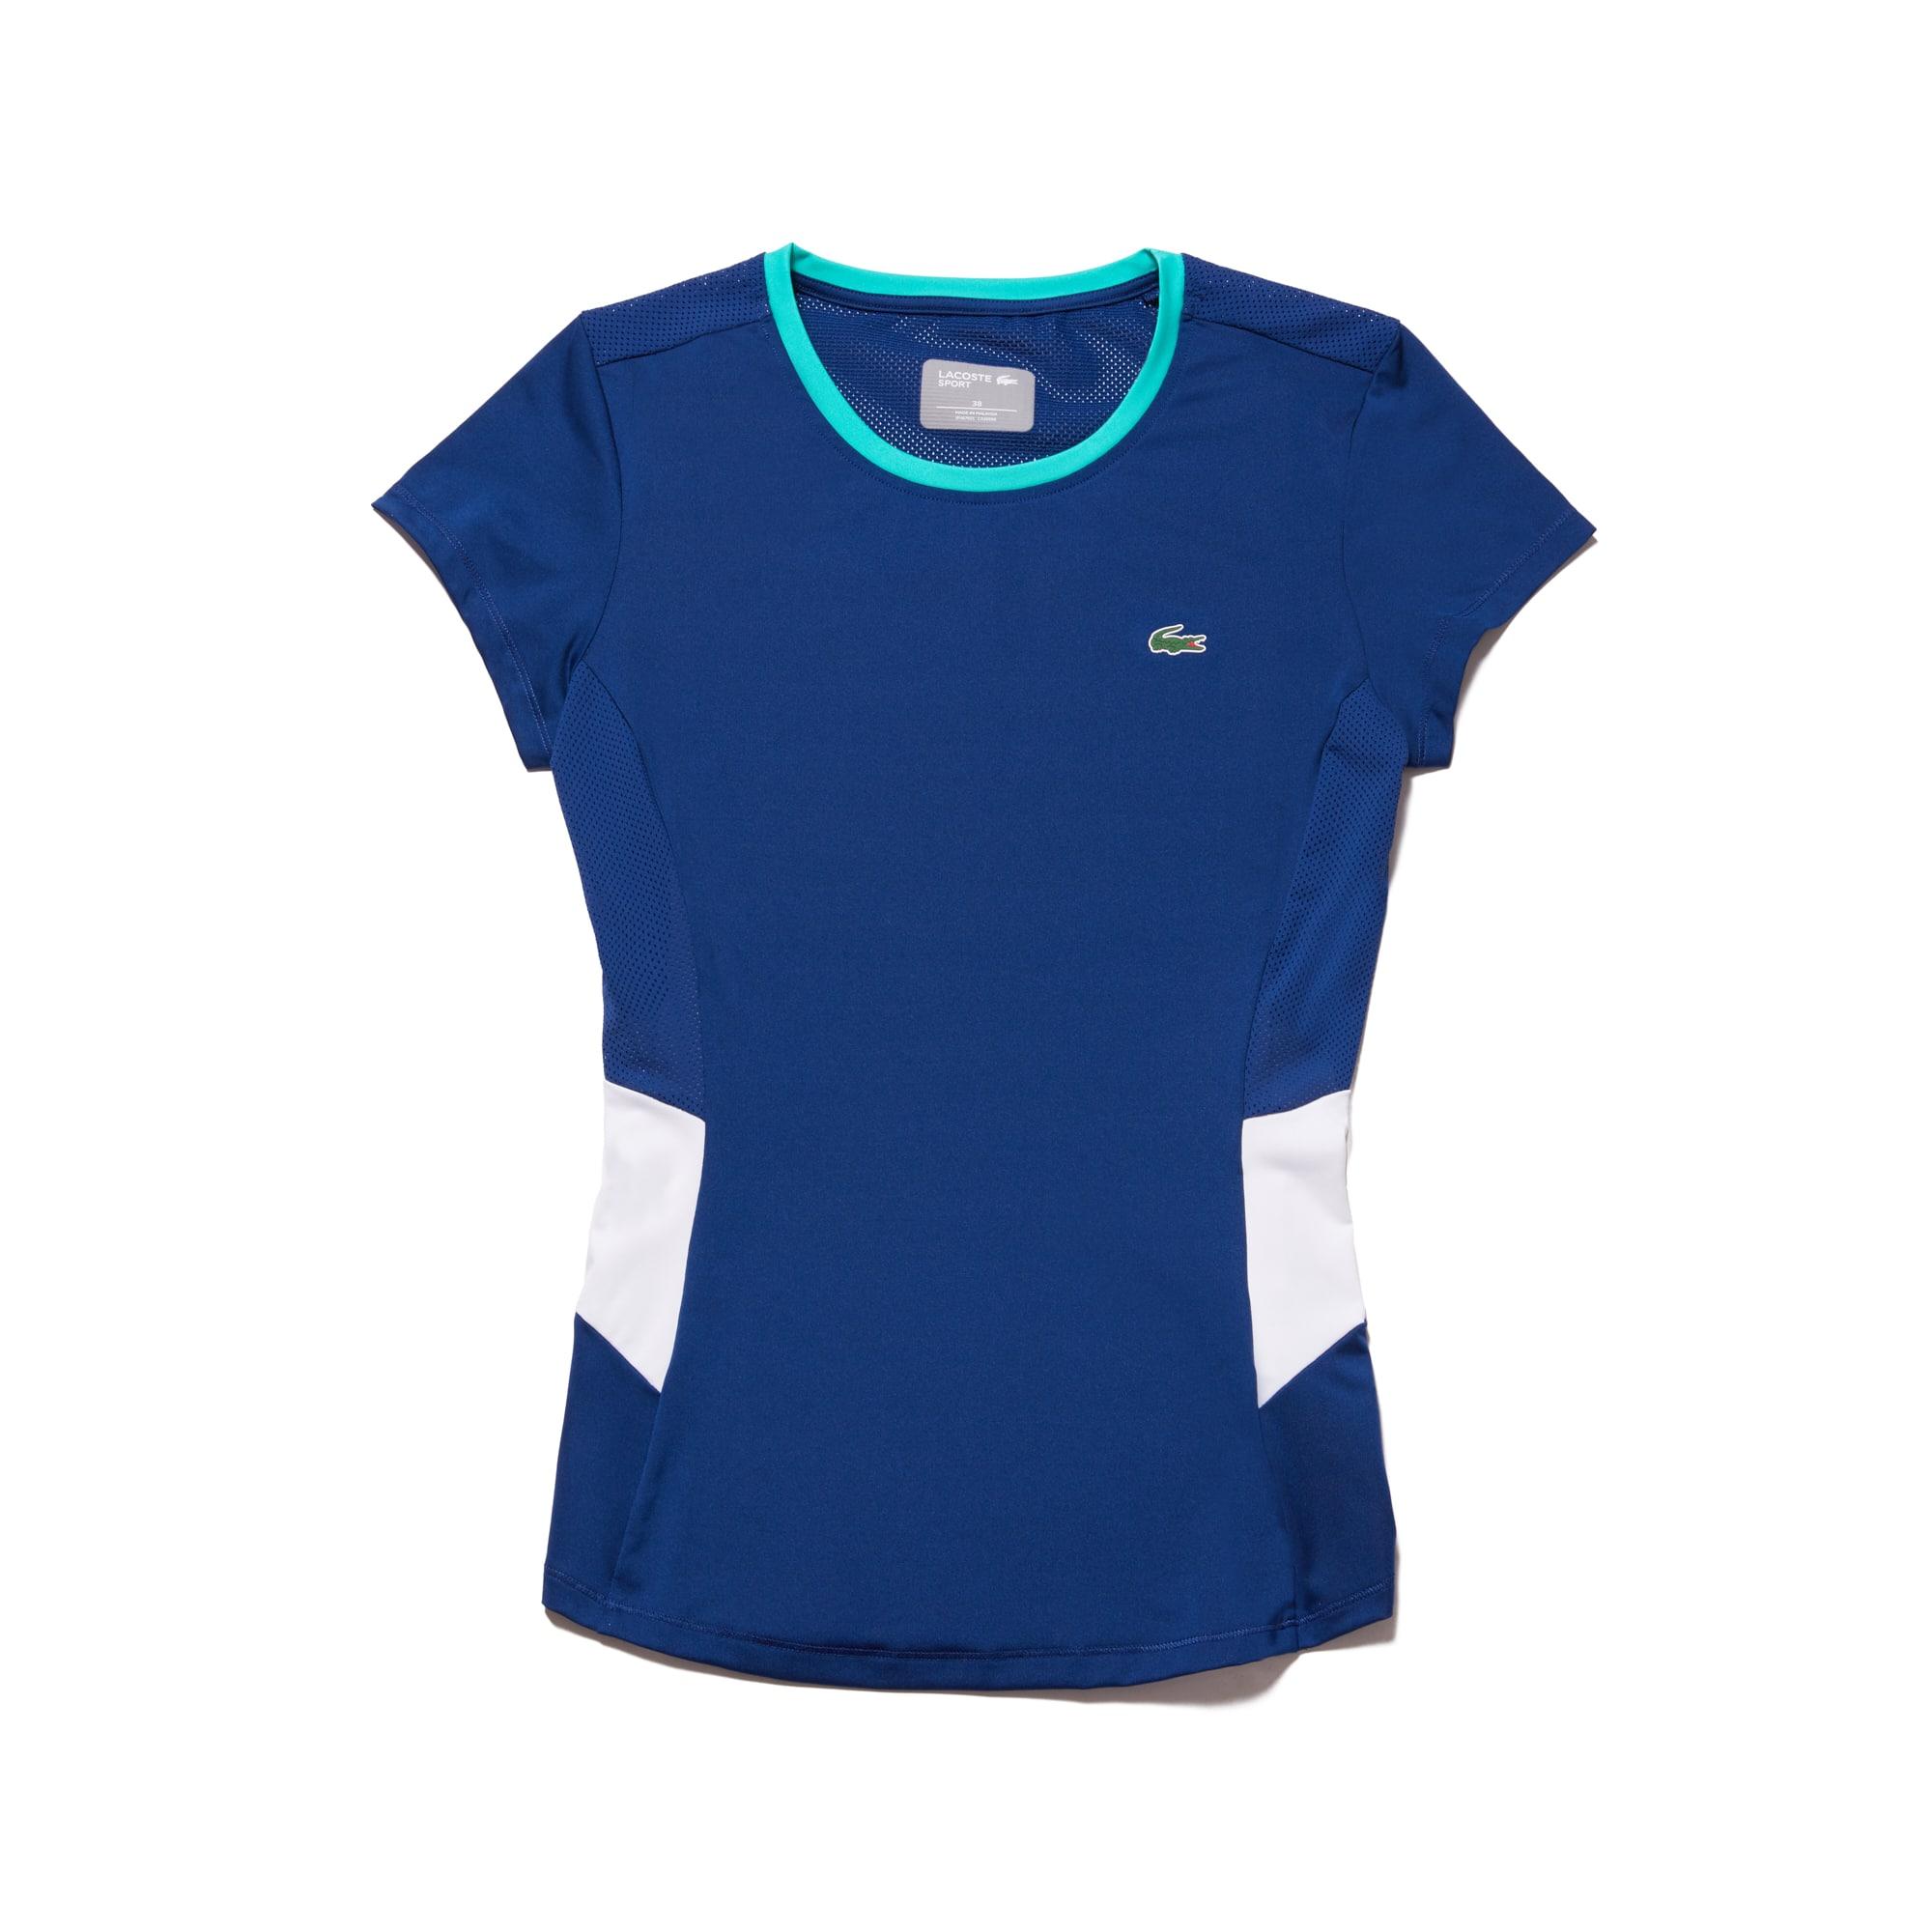 172a37b7fba3 T-Shirts   Tops